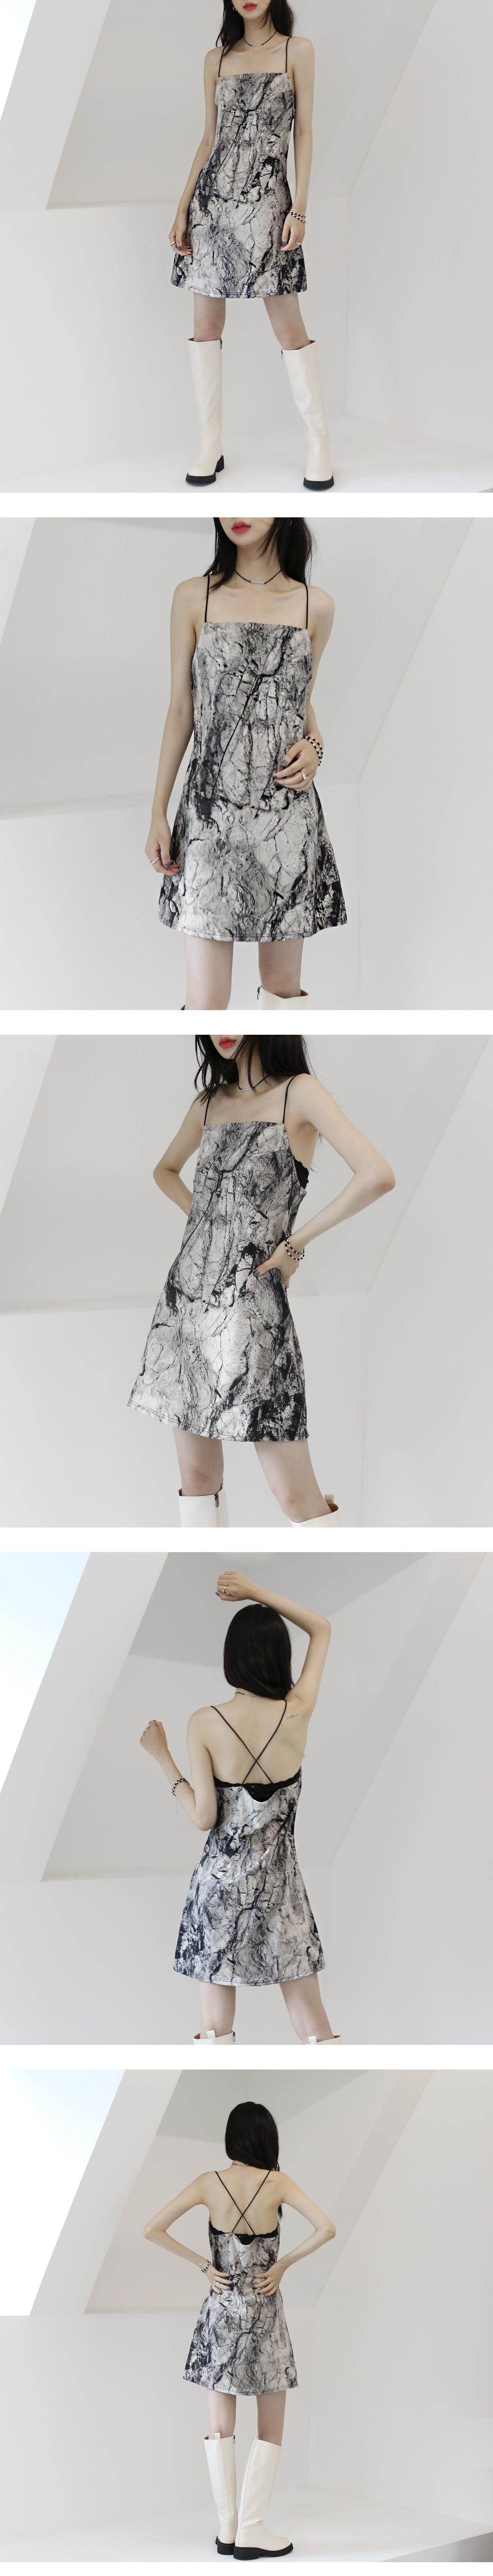 Panic cross strap Dress